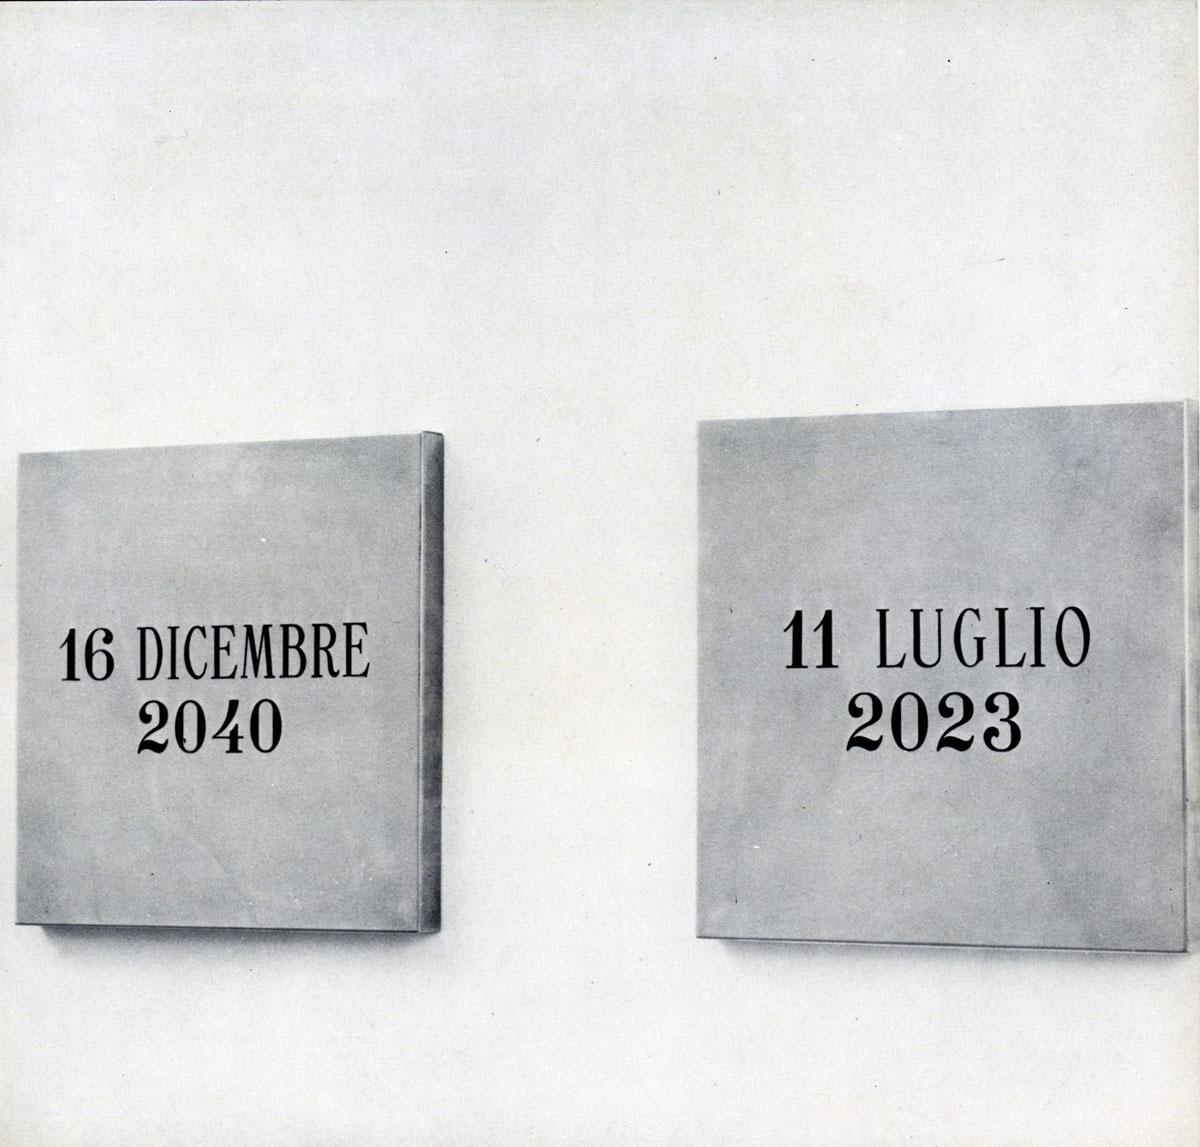 Galleria de foscherari mostra eros ghenos thanatos - boetti 1971.jpg